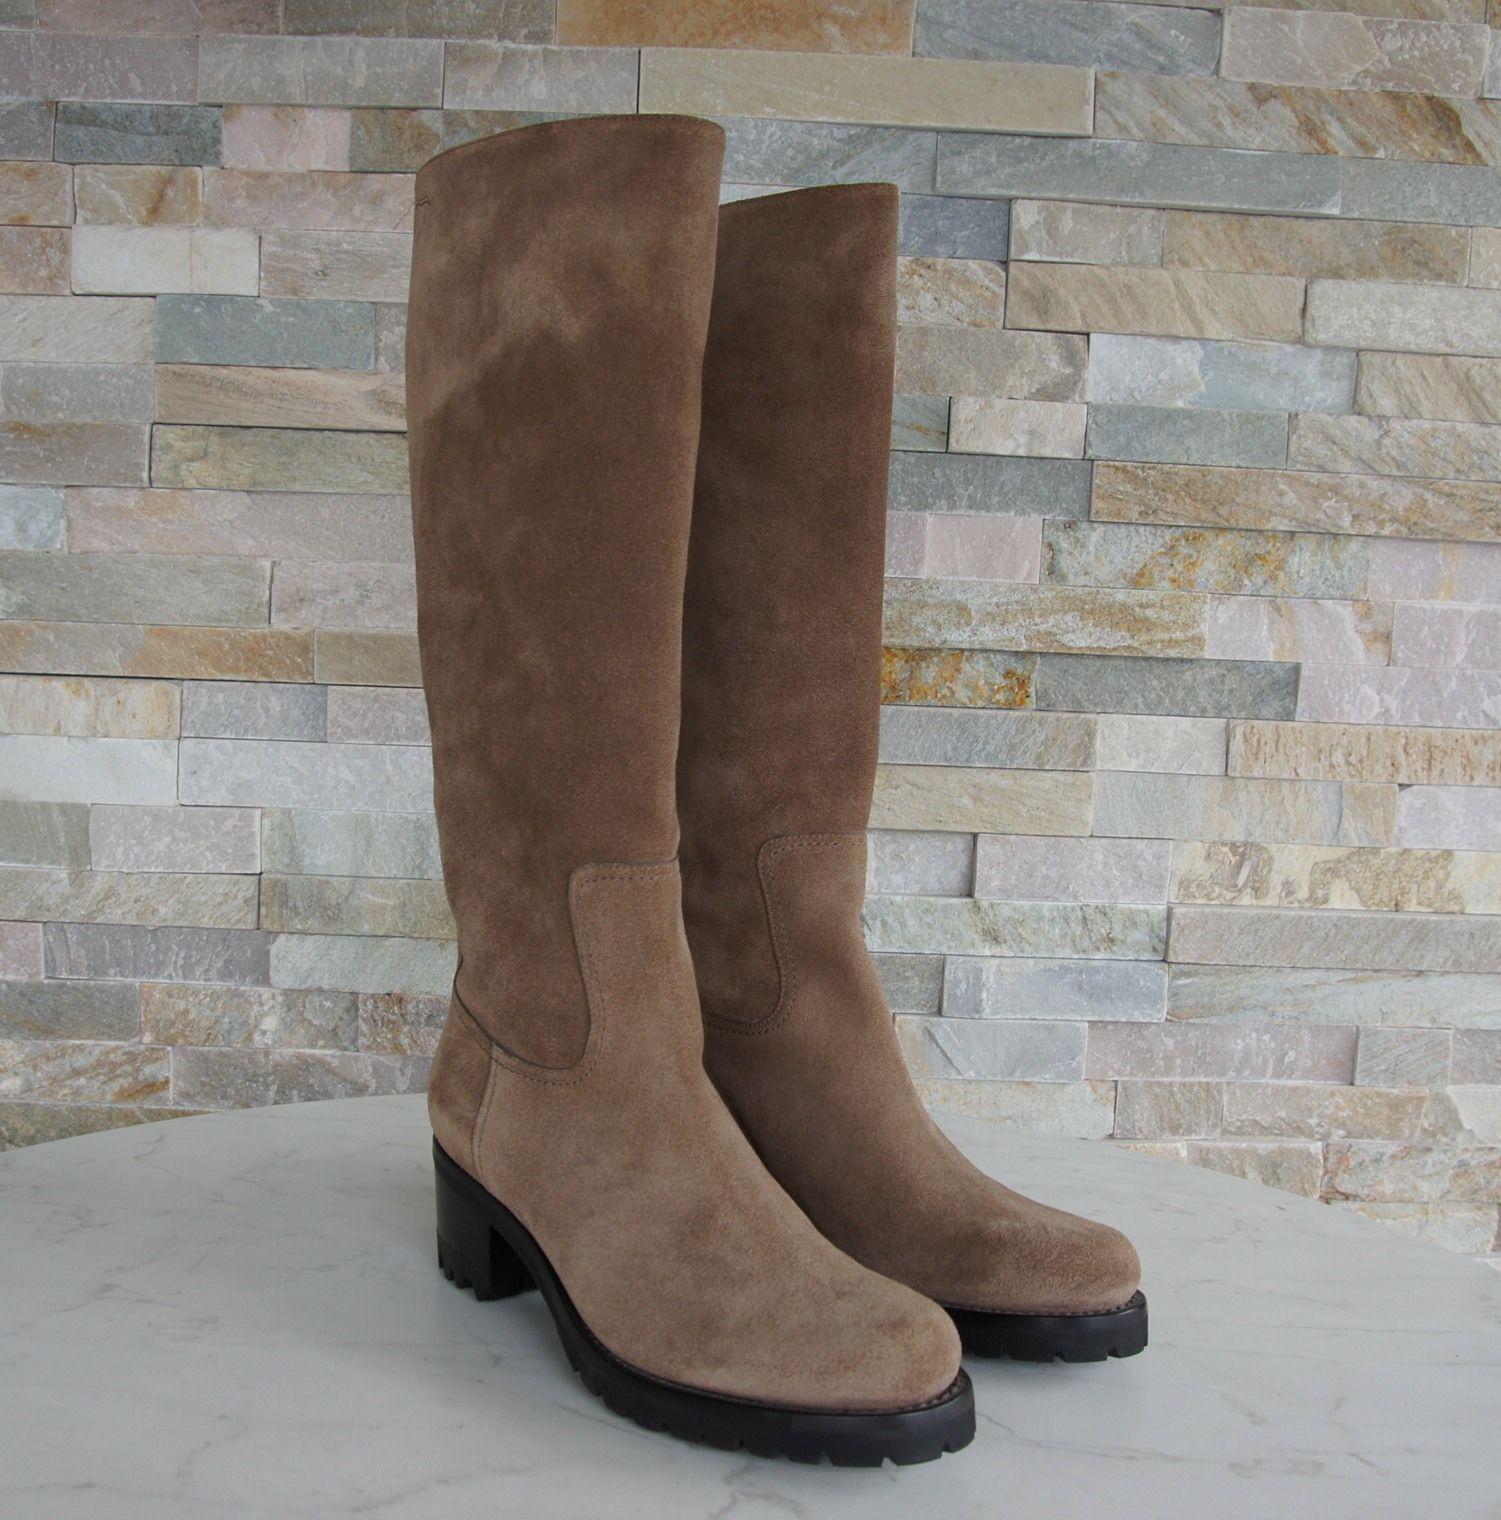 SANTONI Gr Gr Gr 36 Damen Stiefel 52539  Stiefel Schuhe monk braun NEU ehem.   e40865